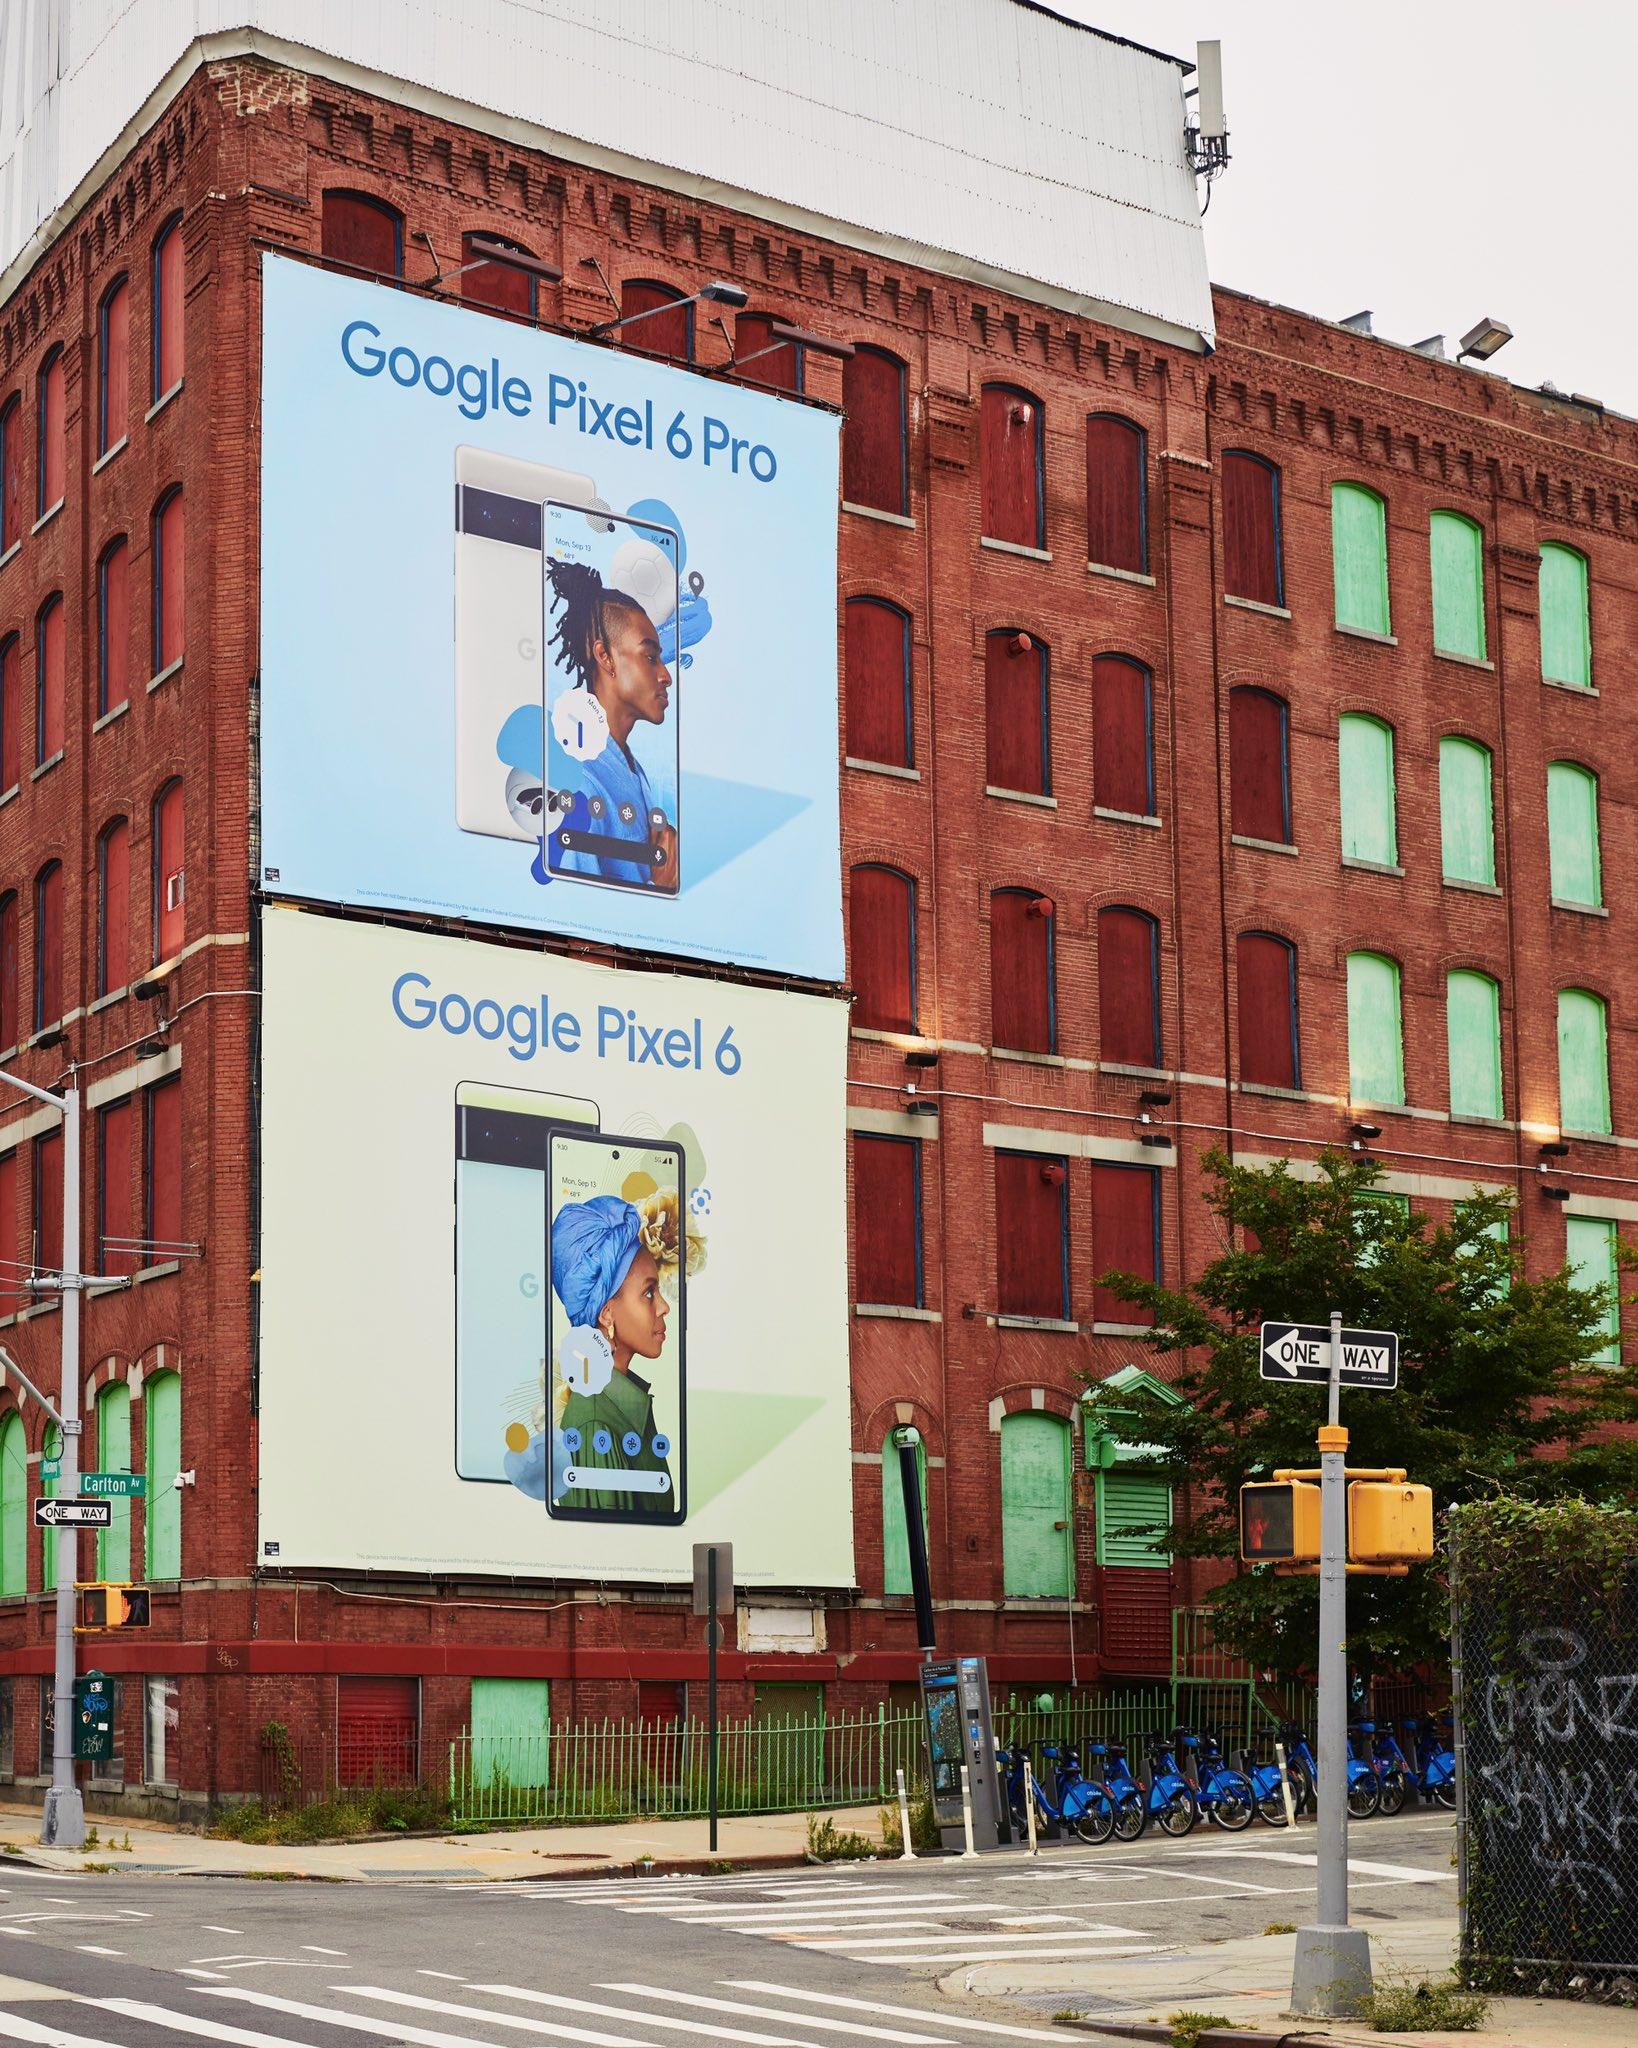 Pixel 6 Pro billboard